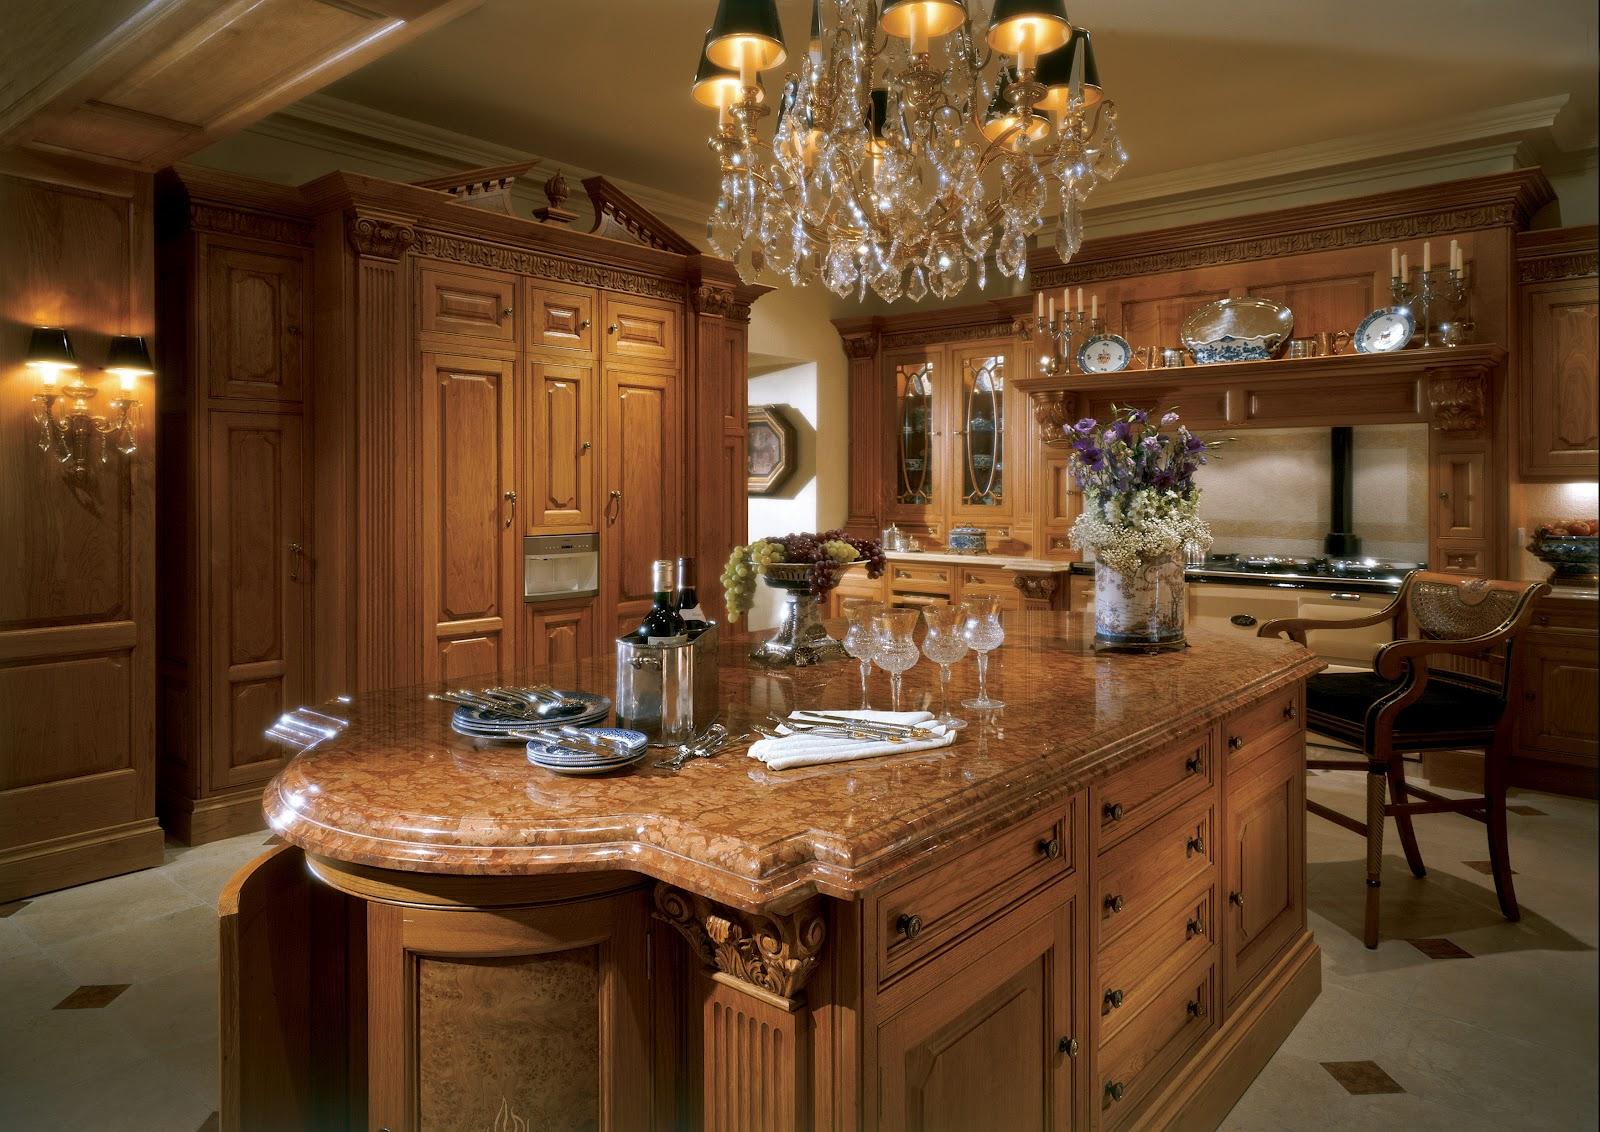 Regency Honey Oak Kitchen With A Victorian Belgravia Mantle